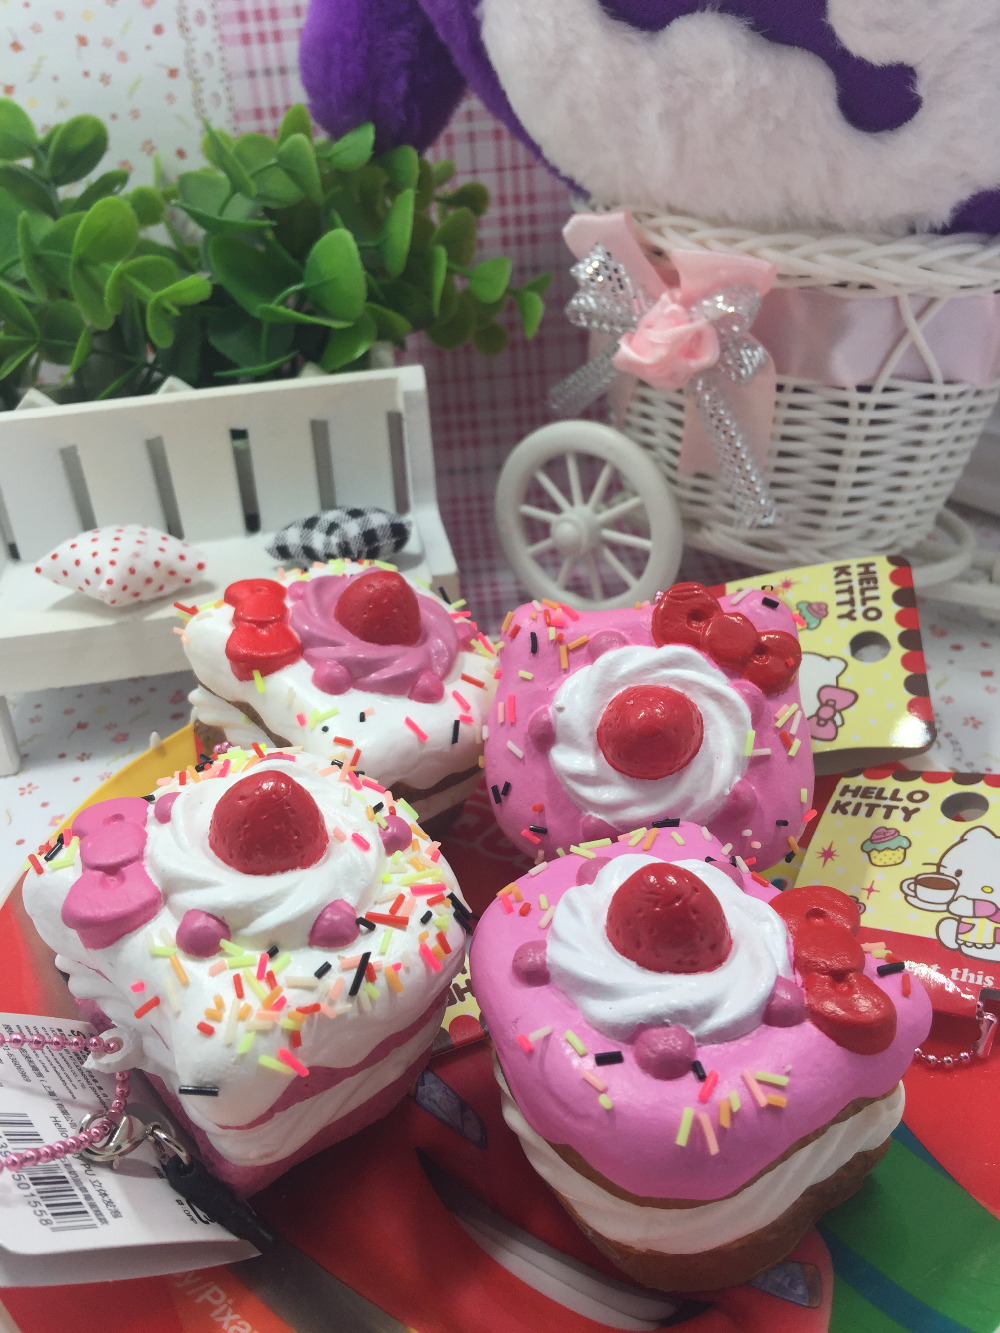 Pachet original Rare Hello Kitty Squishy Tort dulce Squishys Jucării Charm Pink Stress Stripe jucărie Wholesales Squishies 8pcs / Lot 473